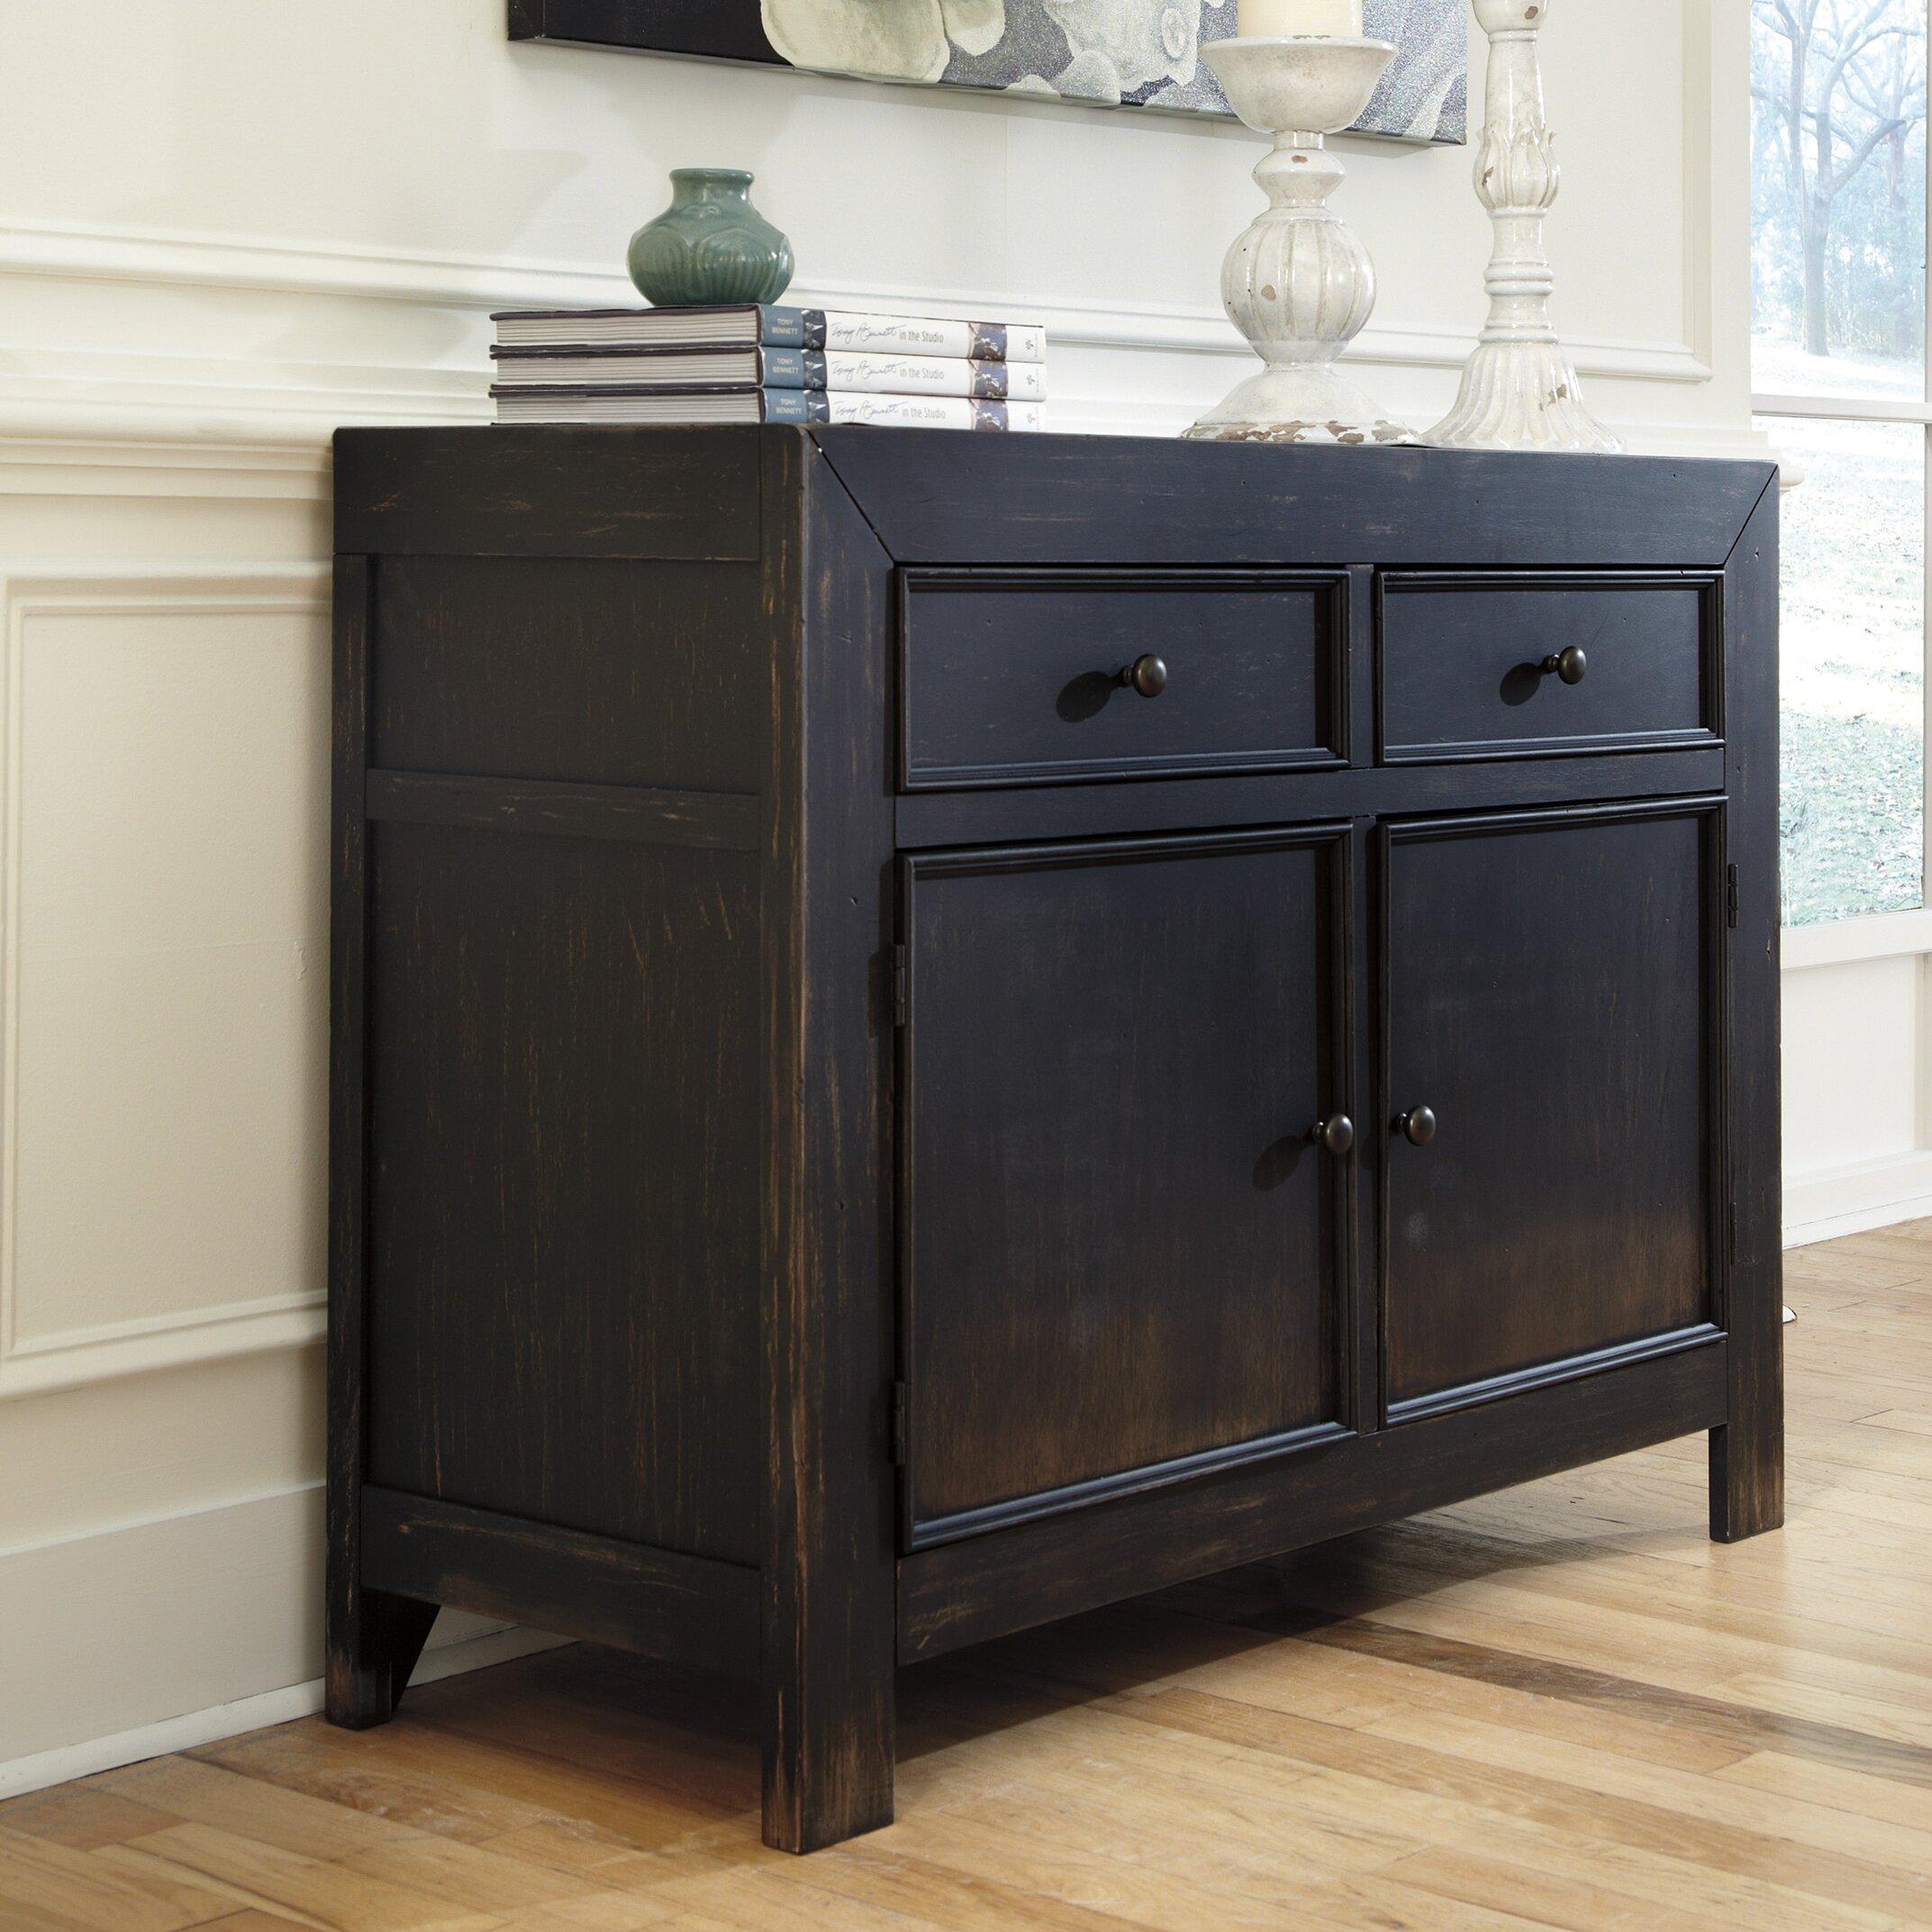 Beachcrest home calvin accent cabinet reviews wayfair for Wayfair kitchen cabinets